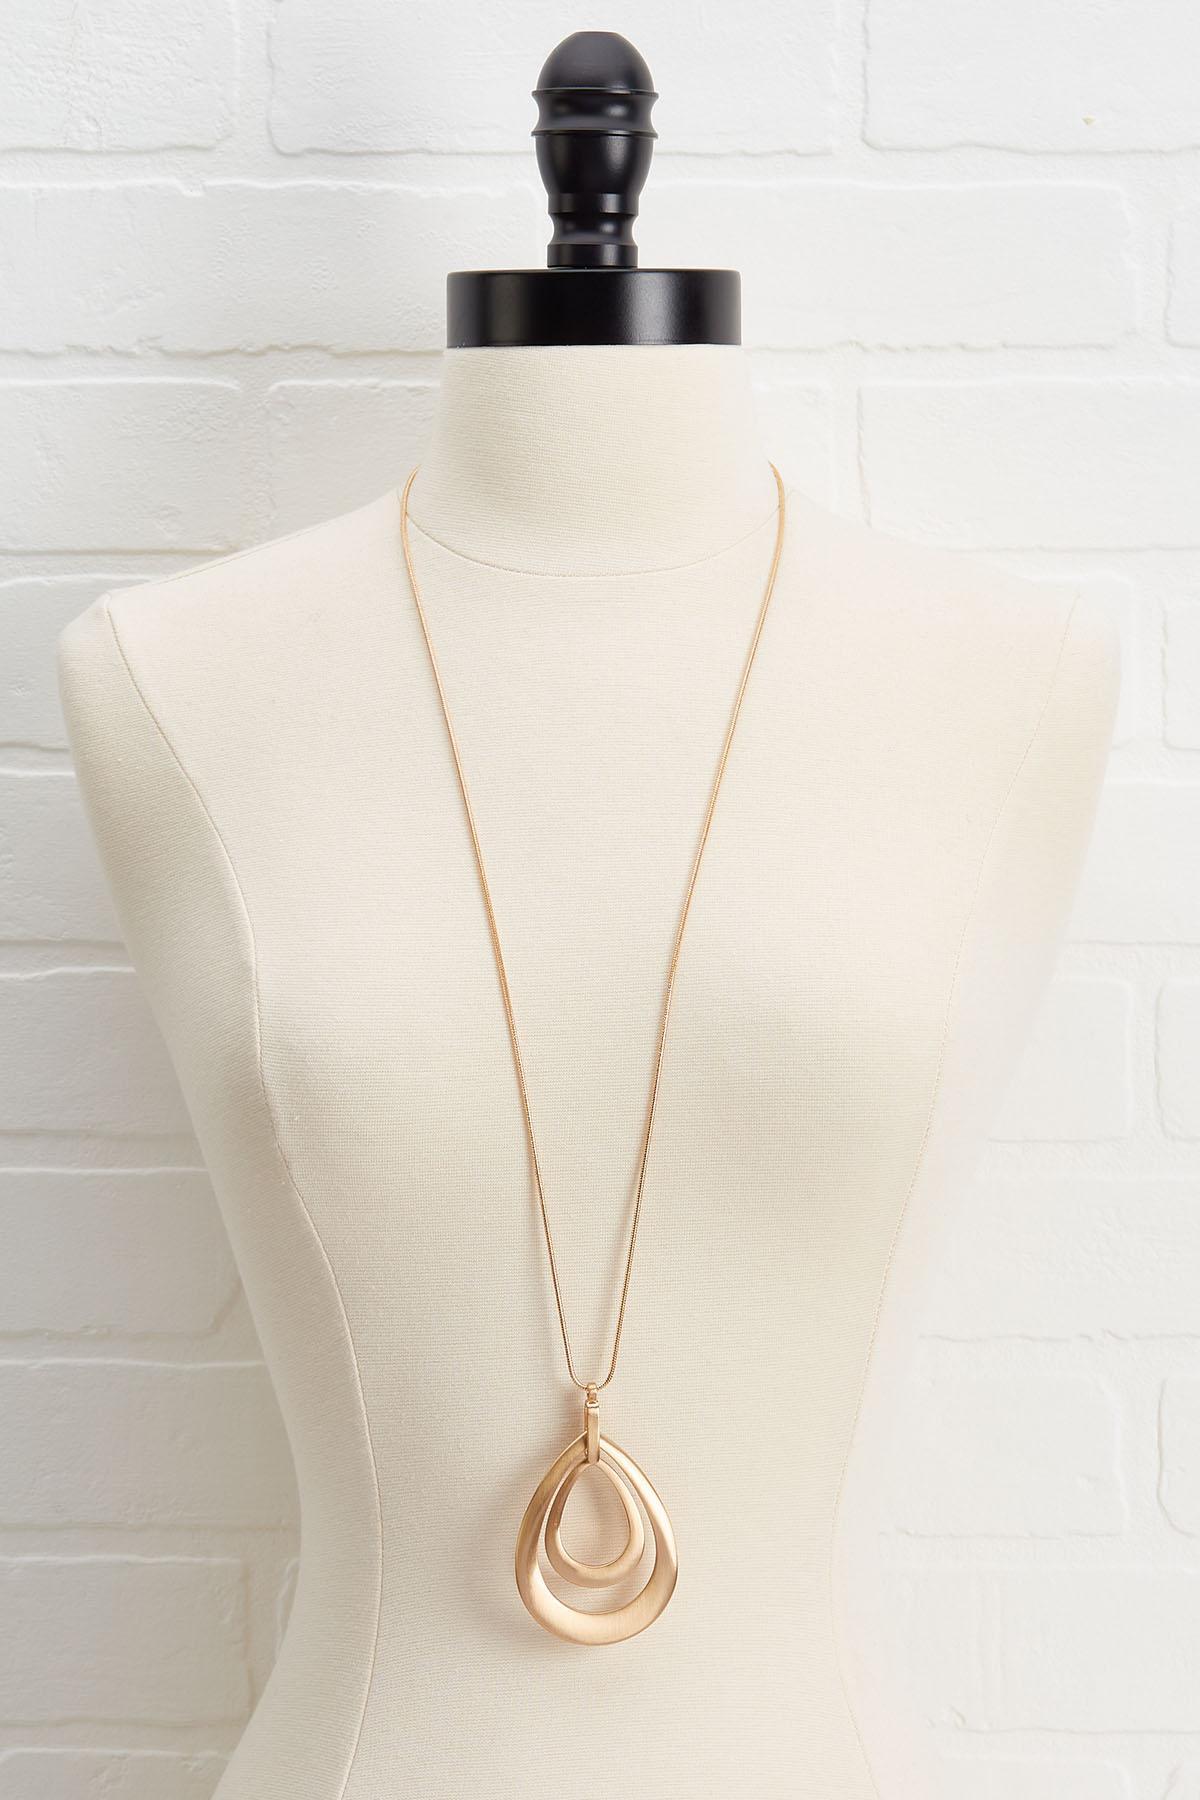 Orbit Pendant Necklace